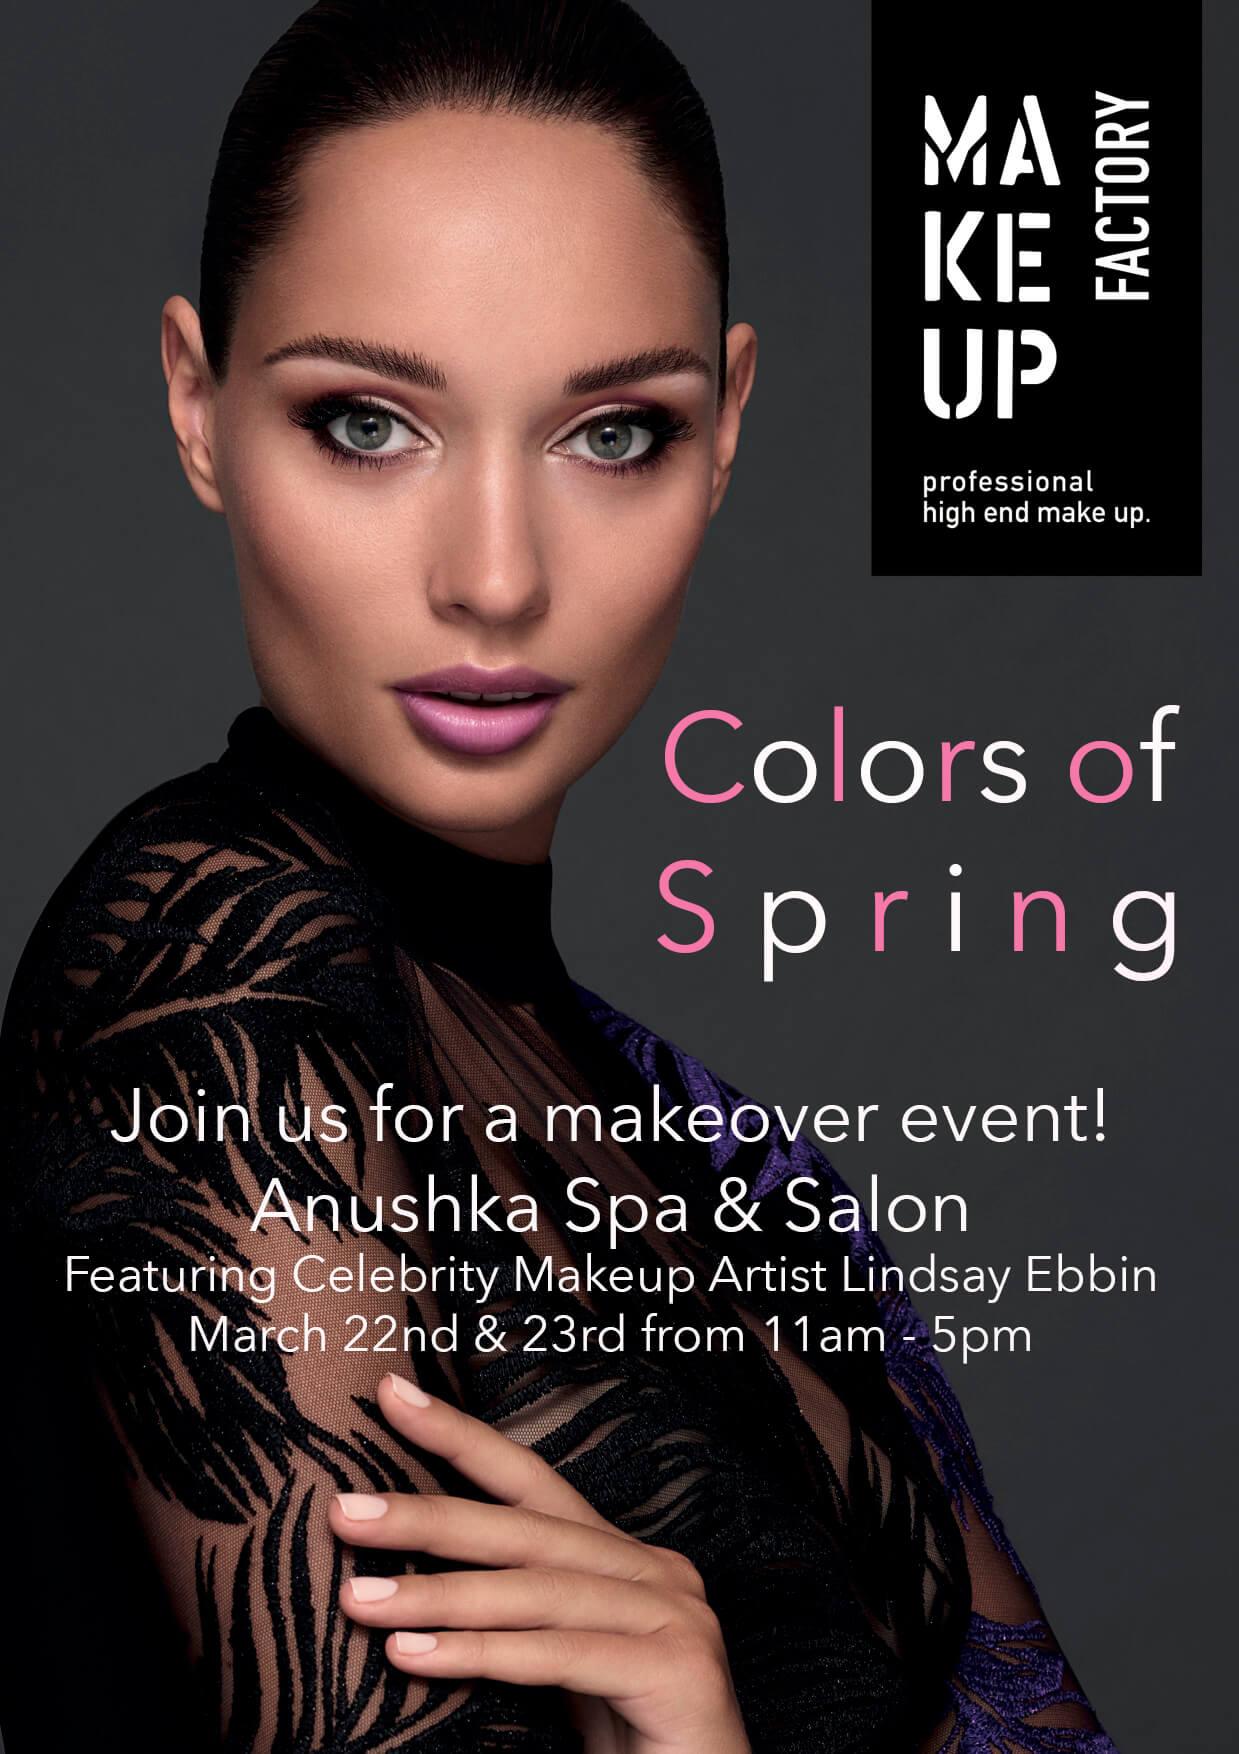 Anushka Spring Makeup Event at Anushka Spa & Salon in West Palm Beach, FL